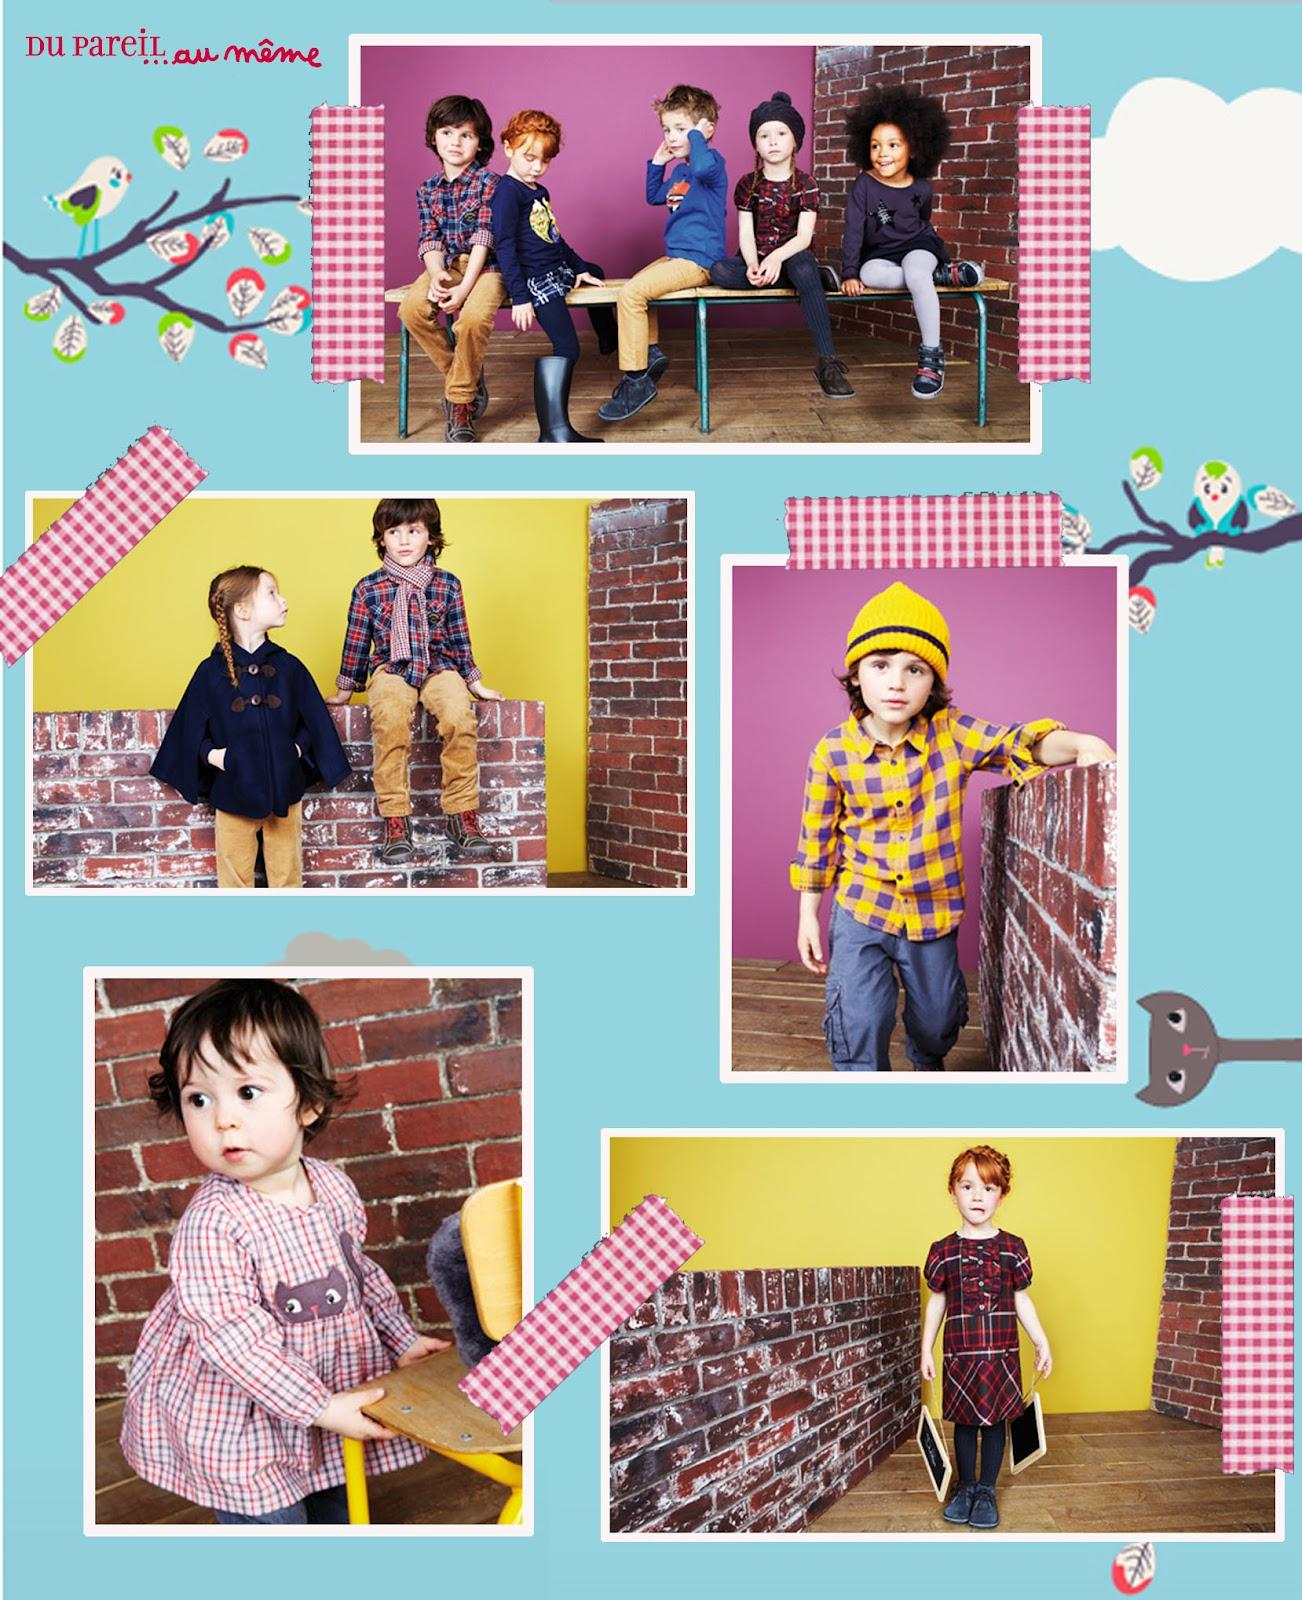 Vestiti per bambini DPAM (Du pareil au meme on line)